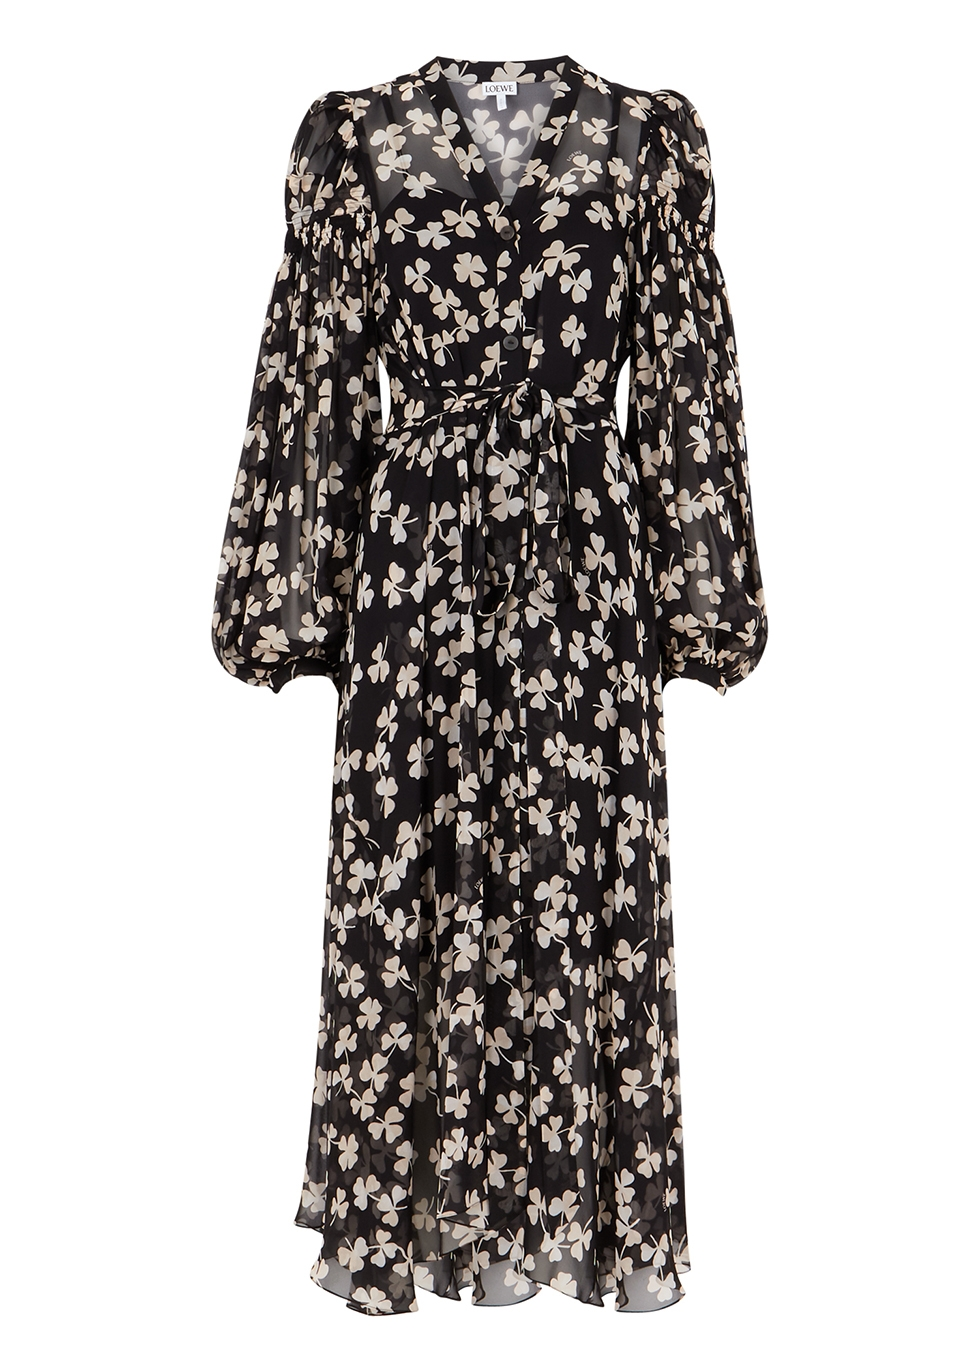 Black printed chiffon midi dress